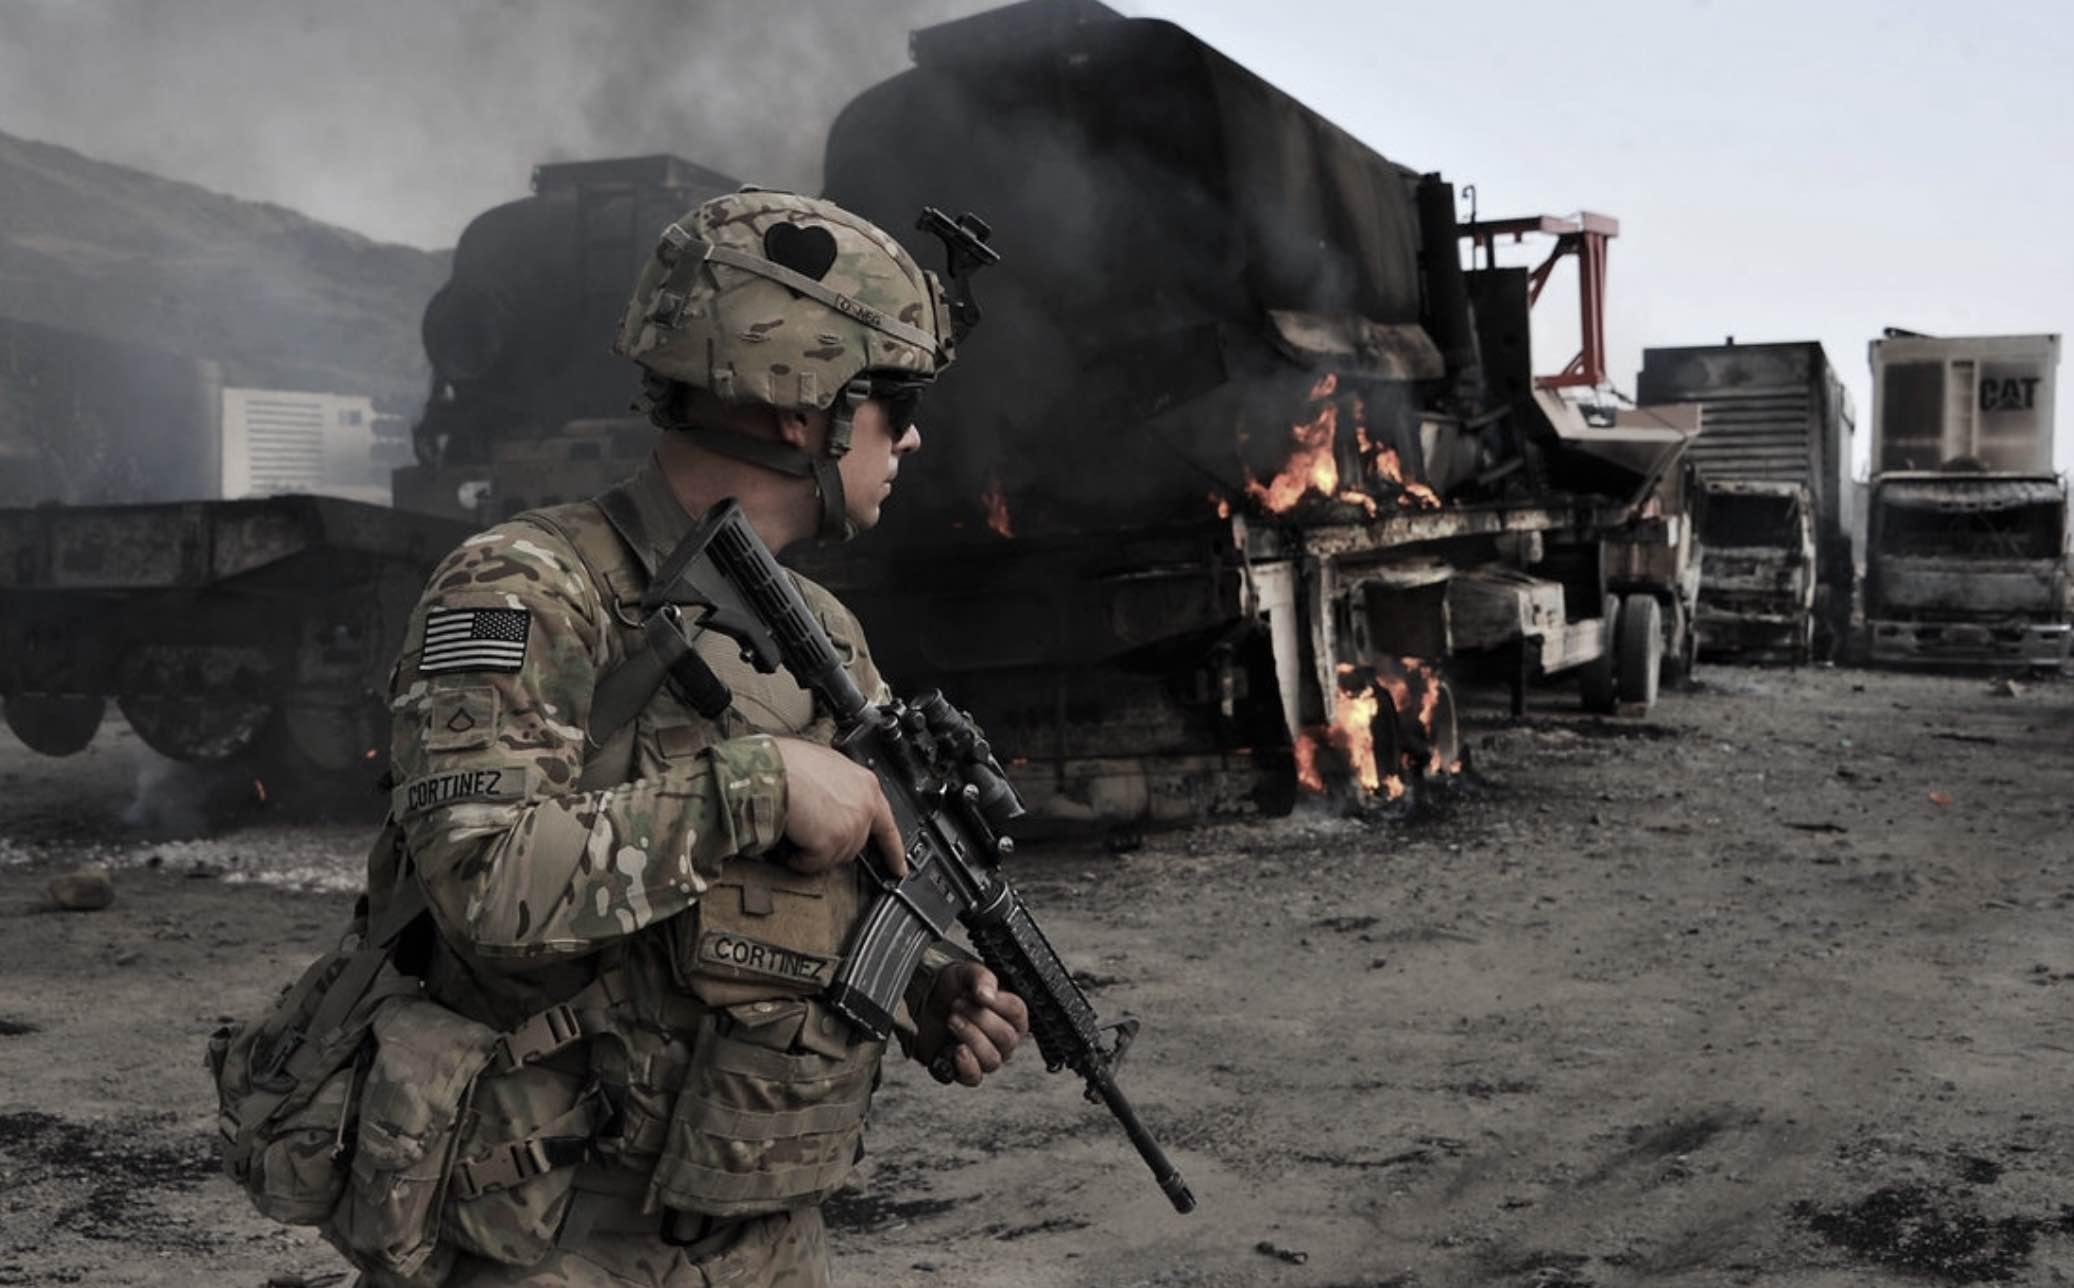 Guerra en Afganistán, Estados Unidos